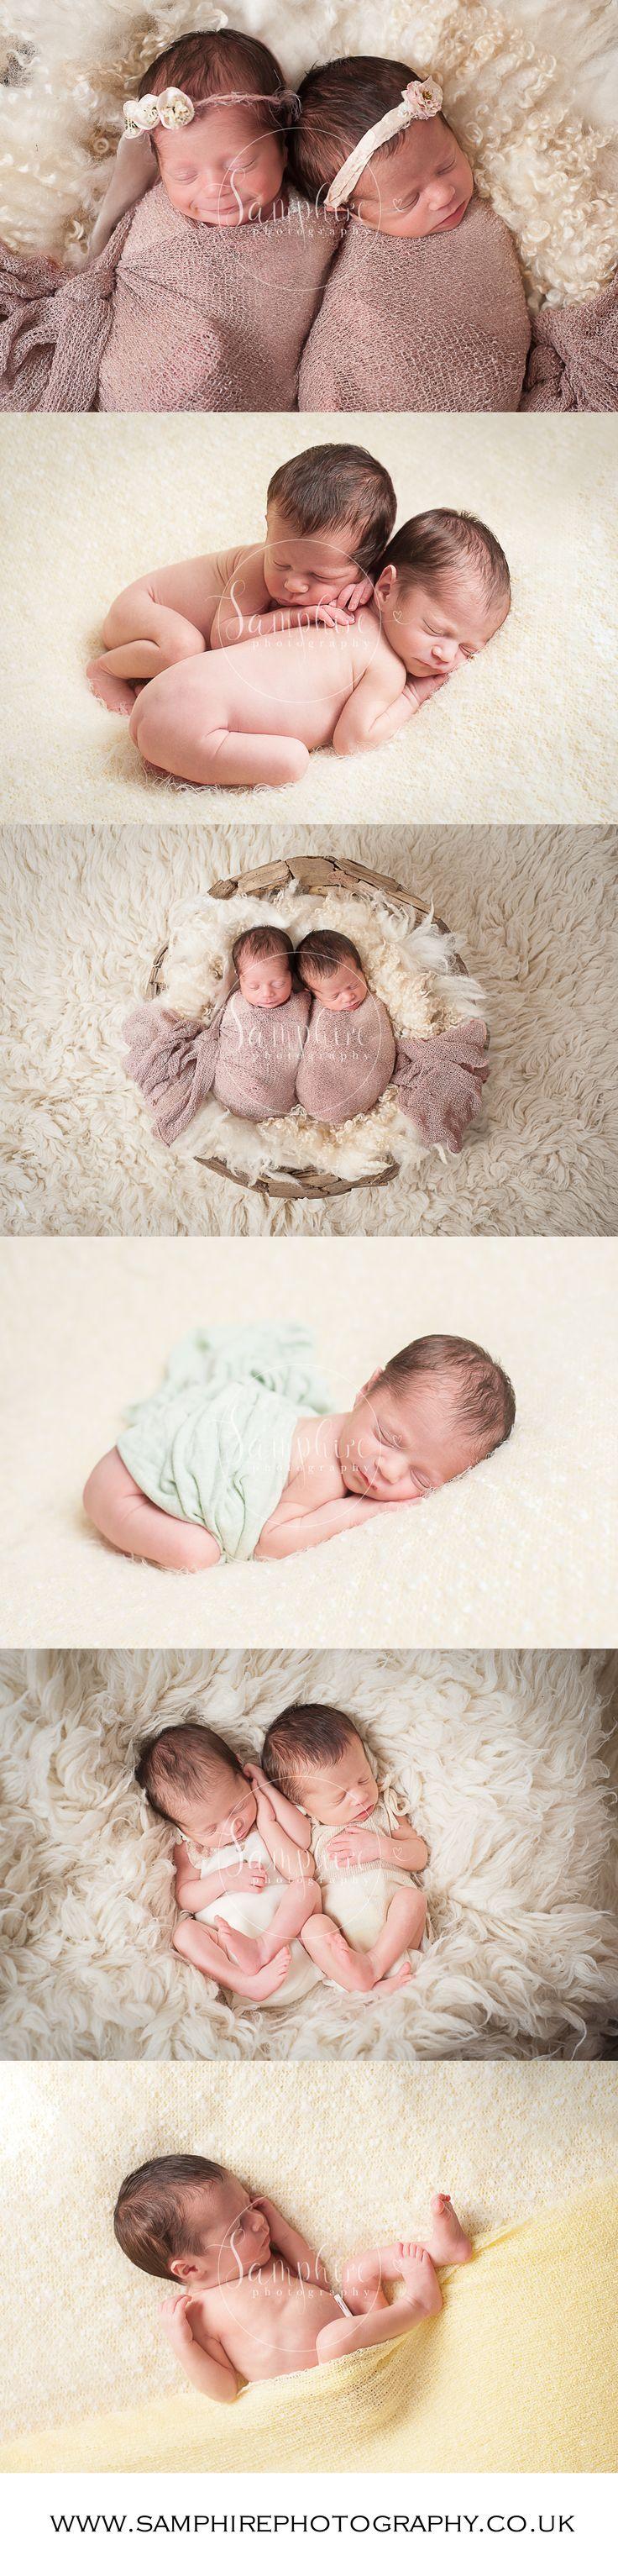 Newborn Twin Girls. Simply too much cuteness to handle. #newbornportraitssussex #newborn #newbornportraitshorsham #Horsham #nickond3 #twins #snuggly